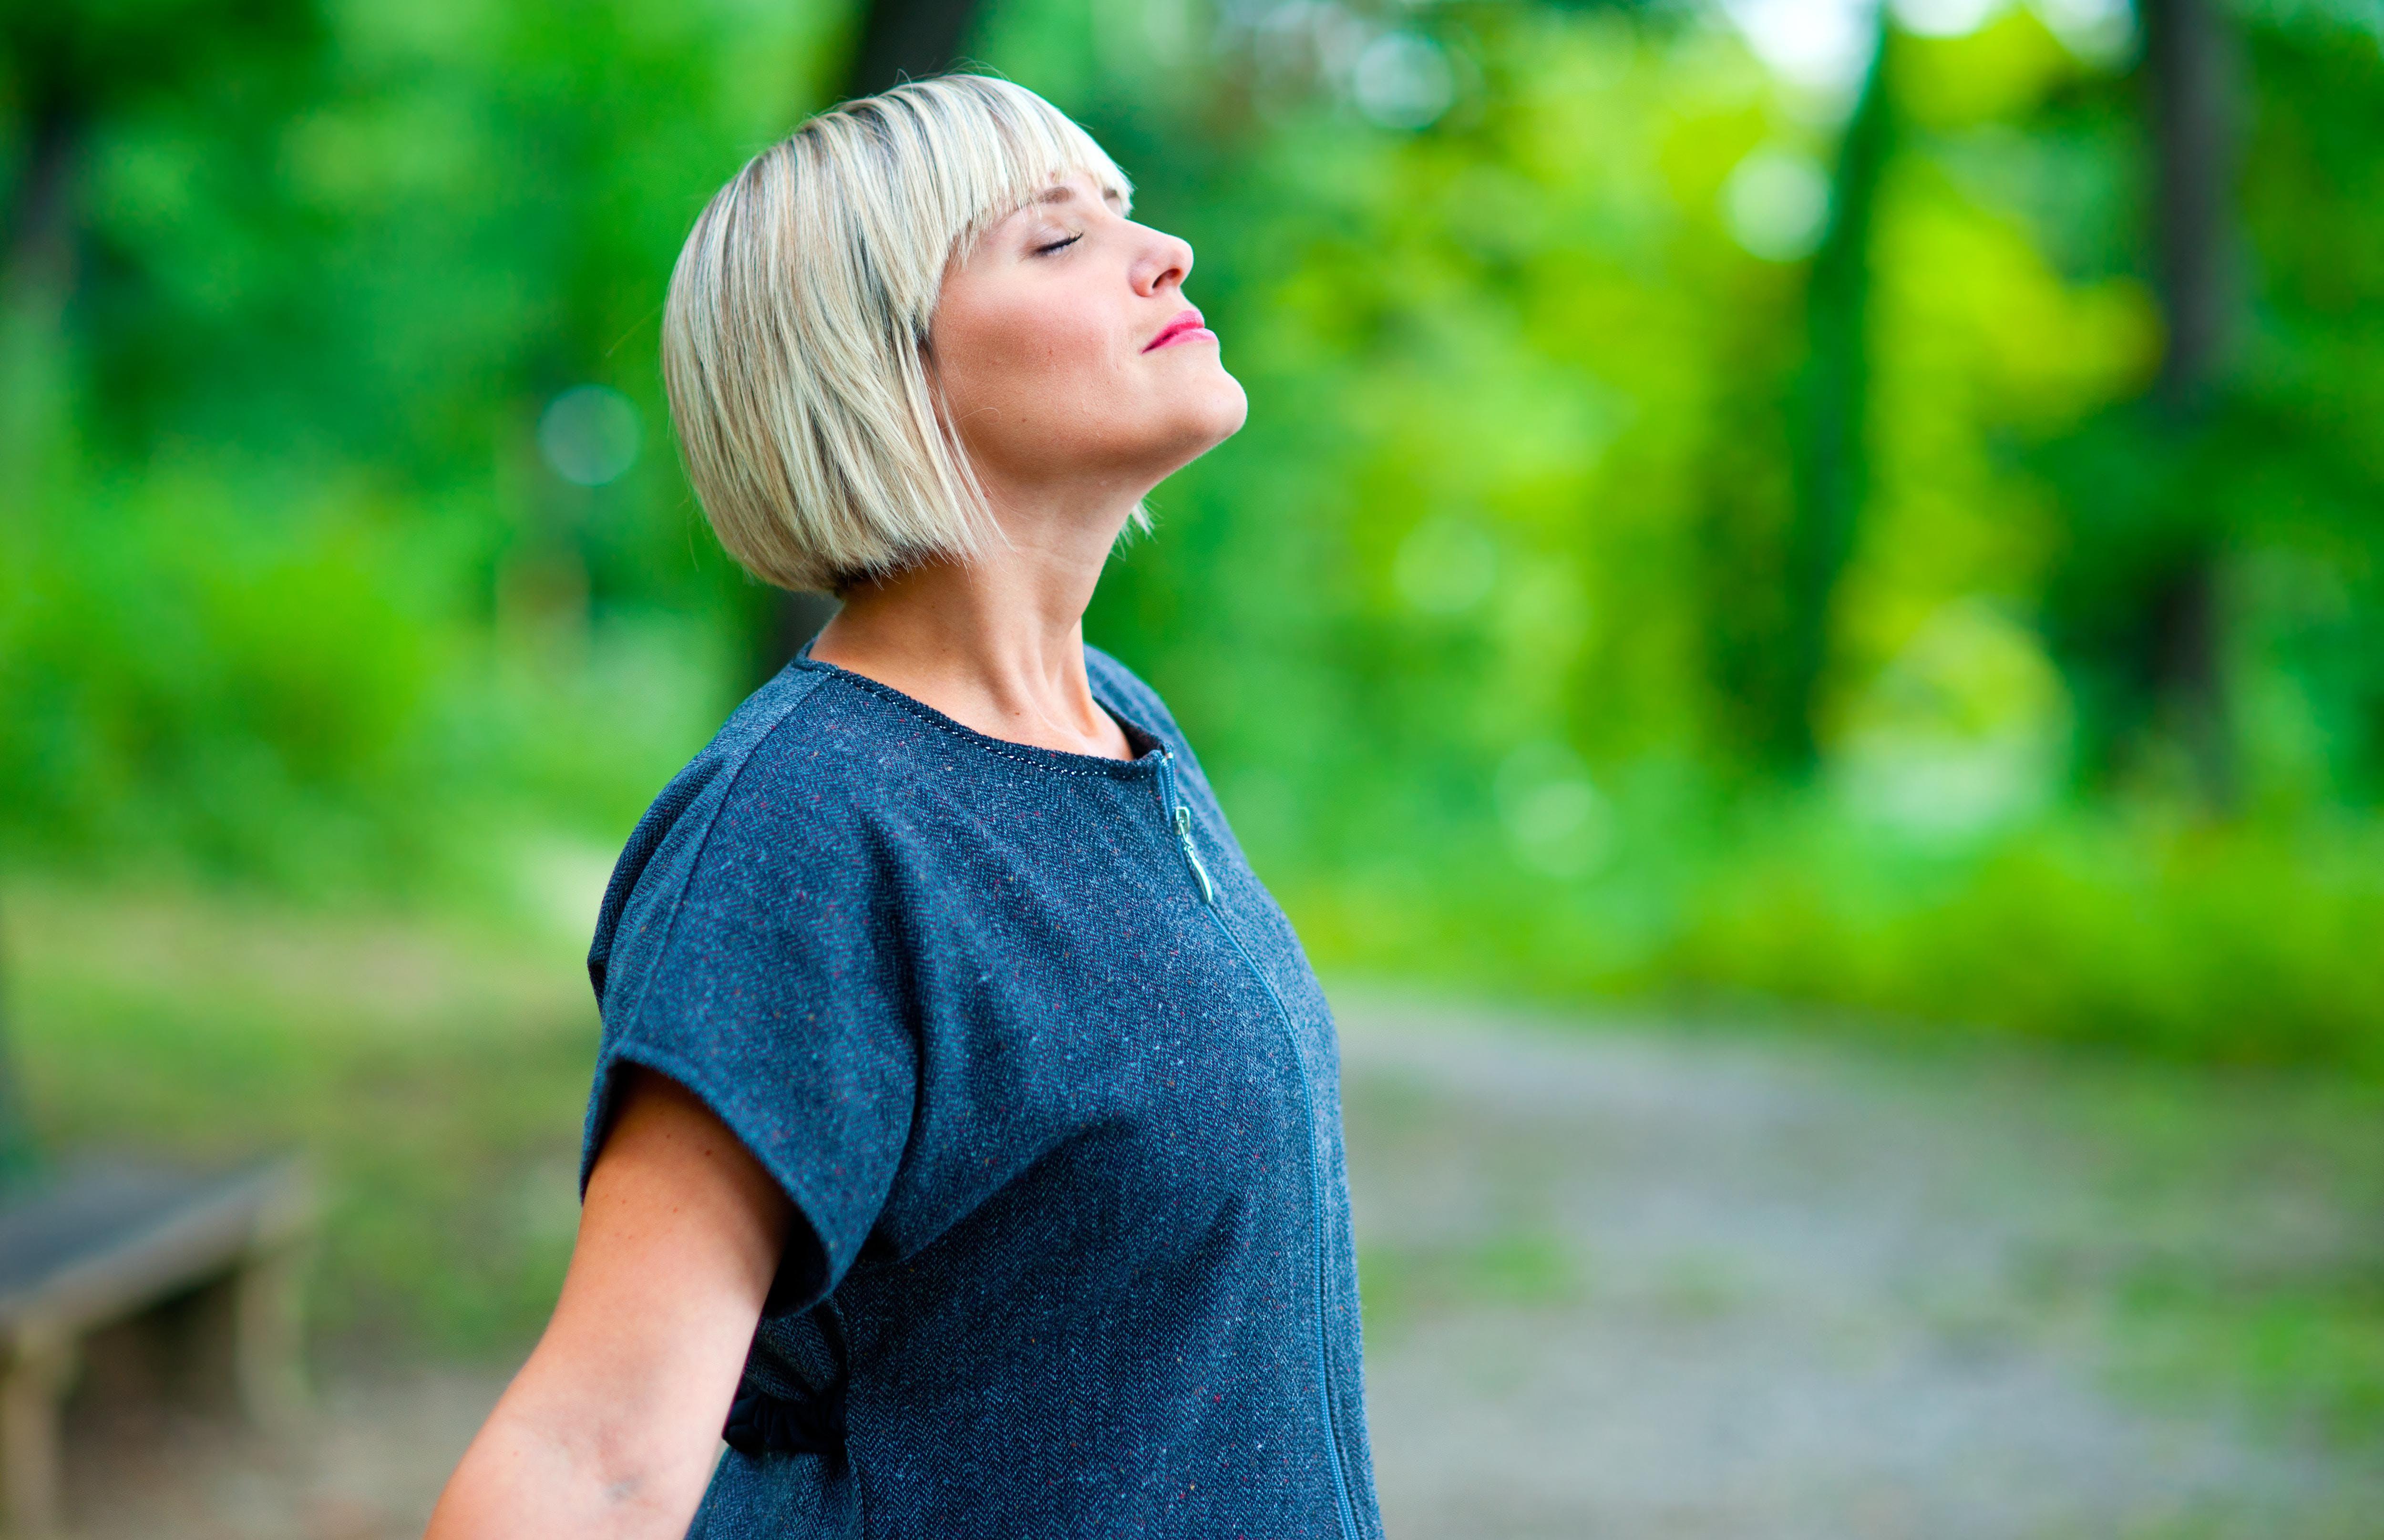 Mindfulness-Based Wellbeing Enhancement (MBWE) - Jan 2020